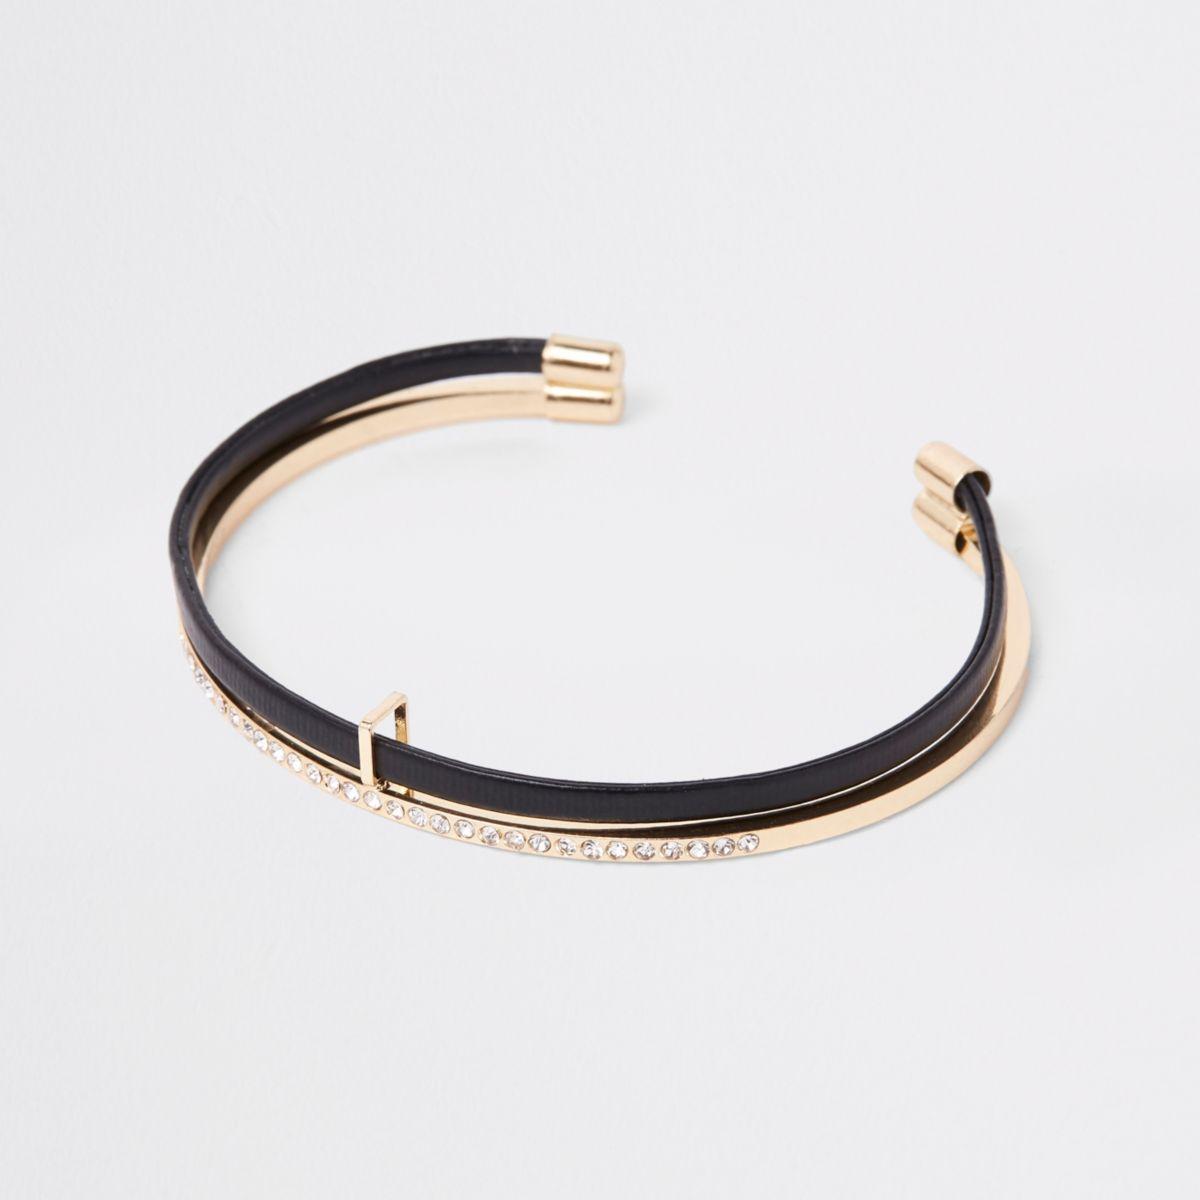 Black gold tone double layered cuff bracelet